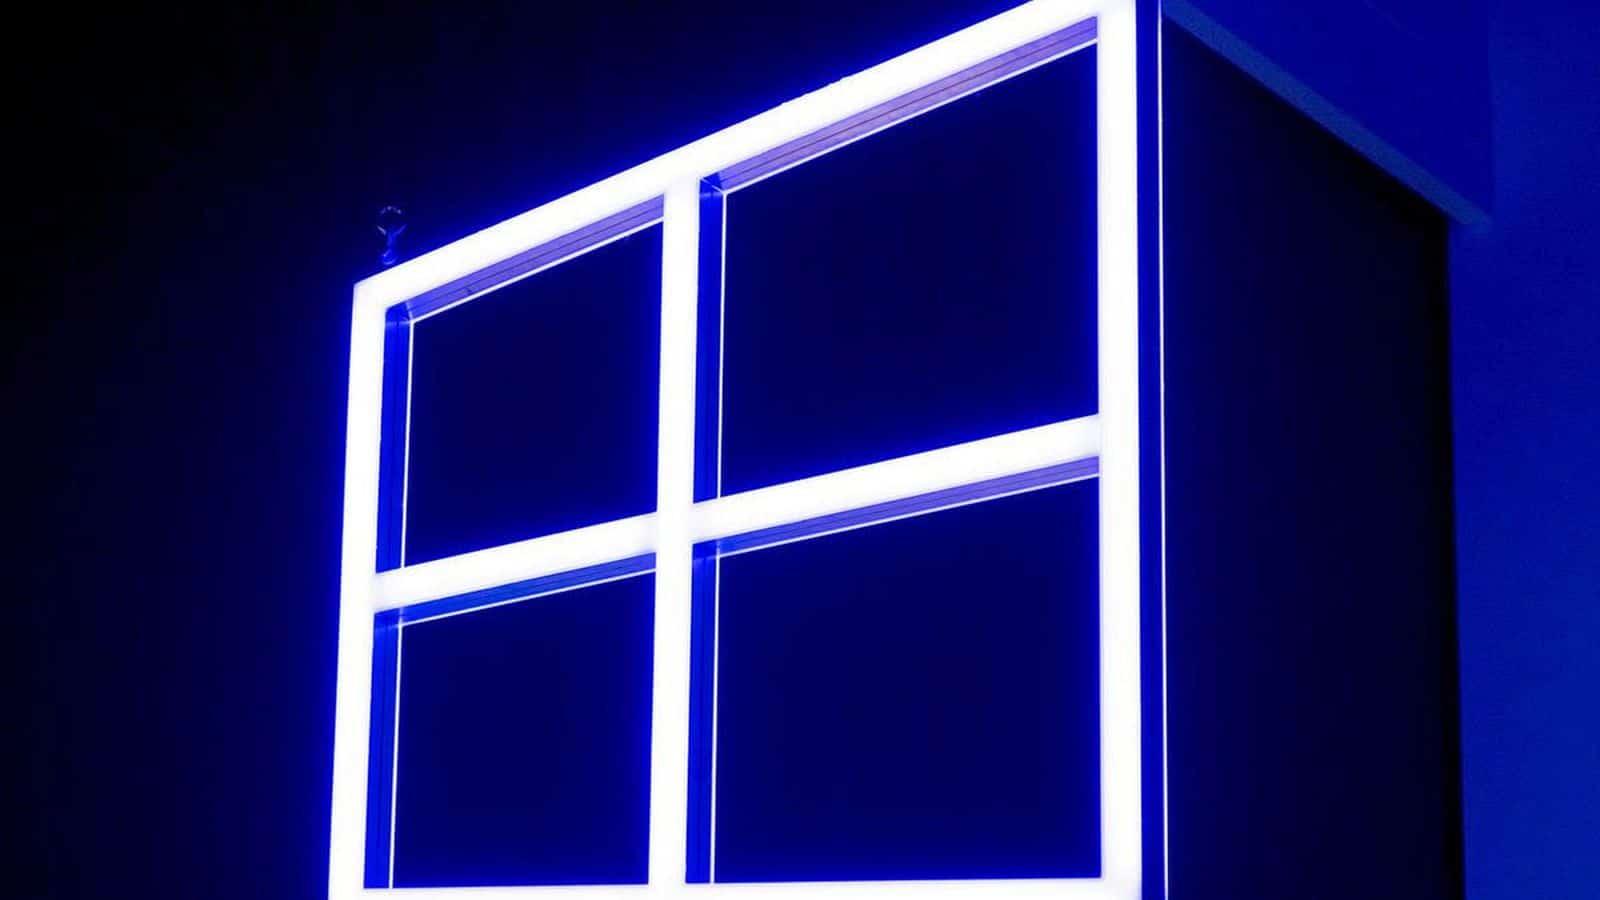 windows-10-anniversary 2-sospc.name